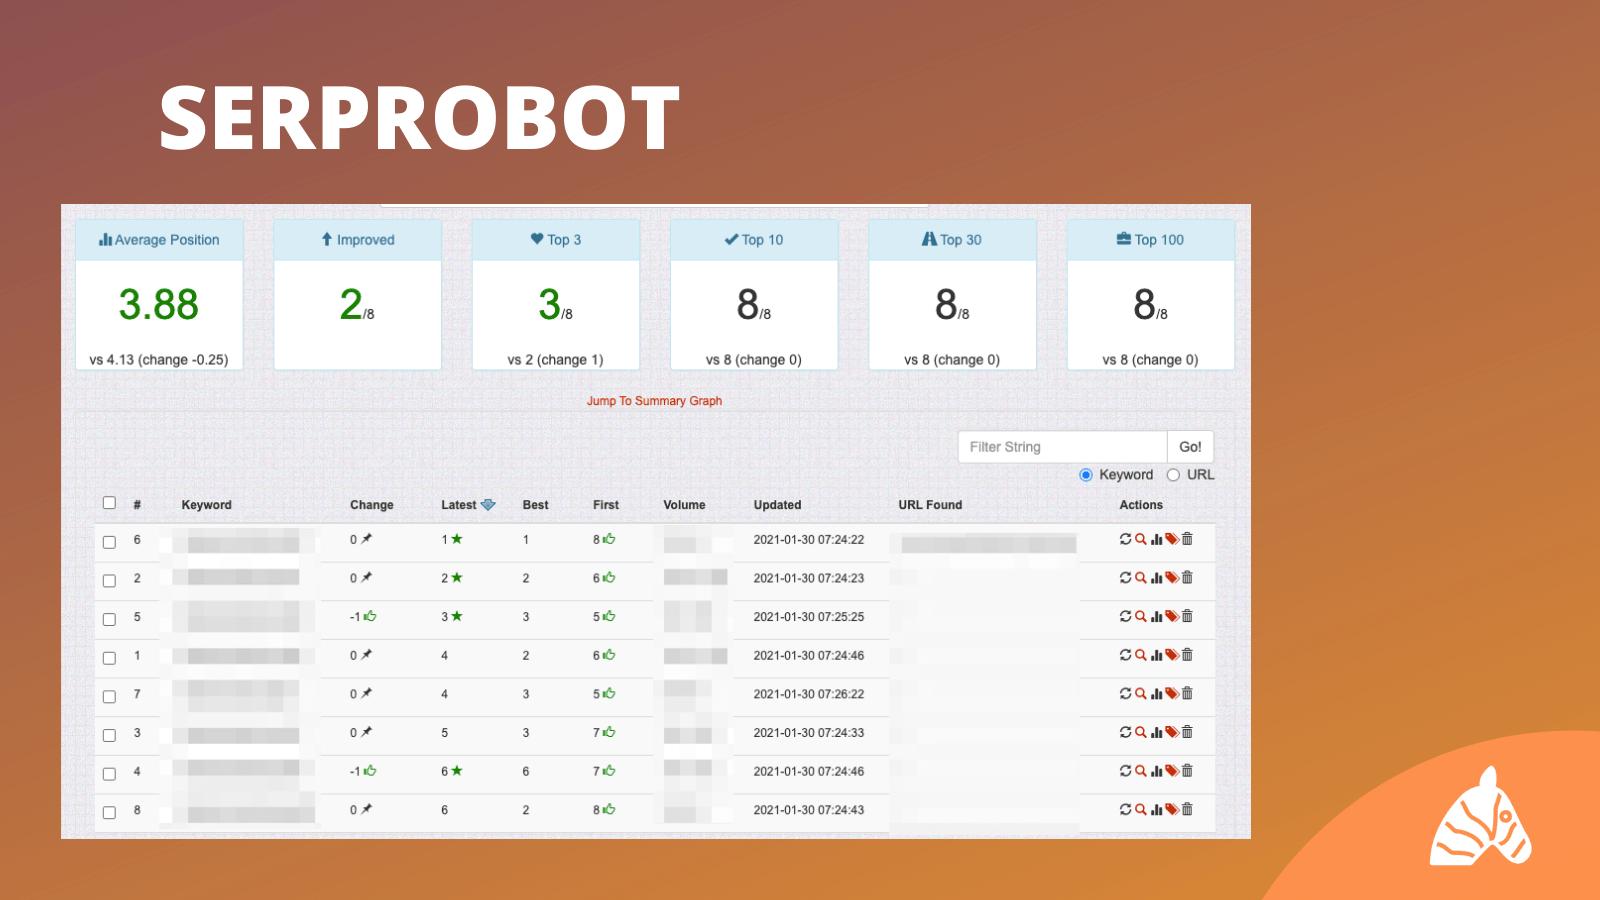 SERPROBOT SEO ranking tool infographic